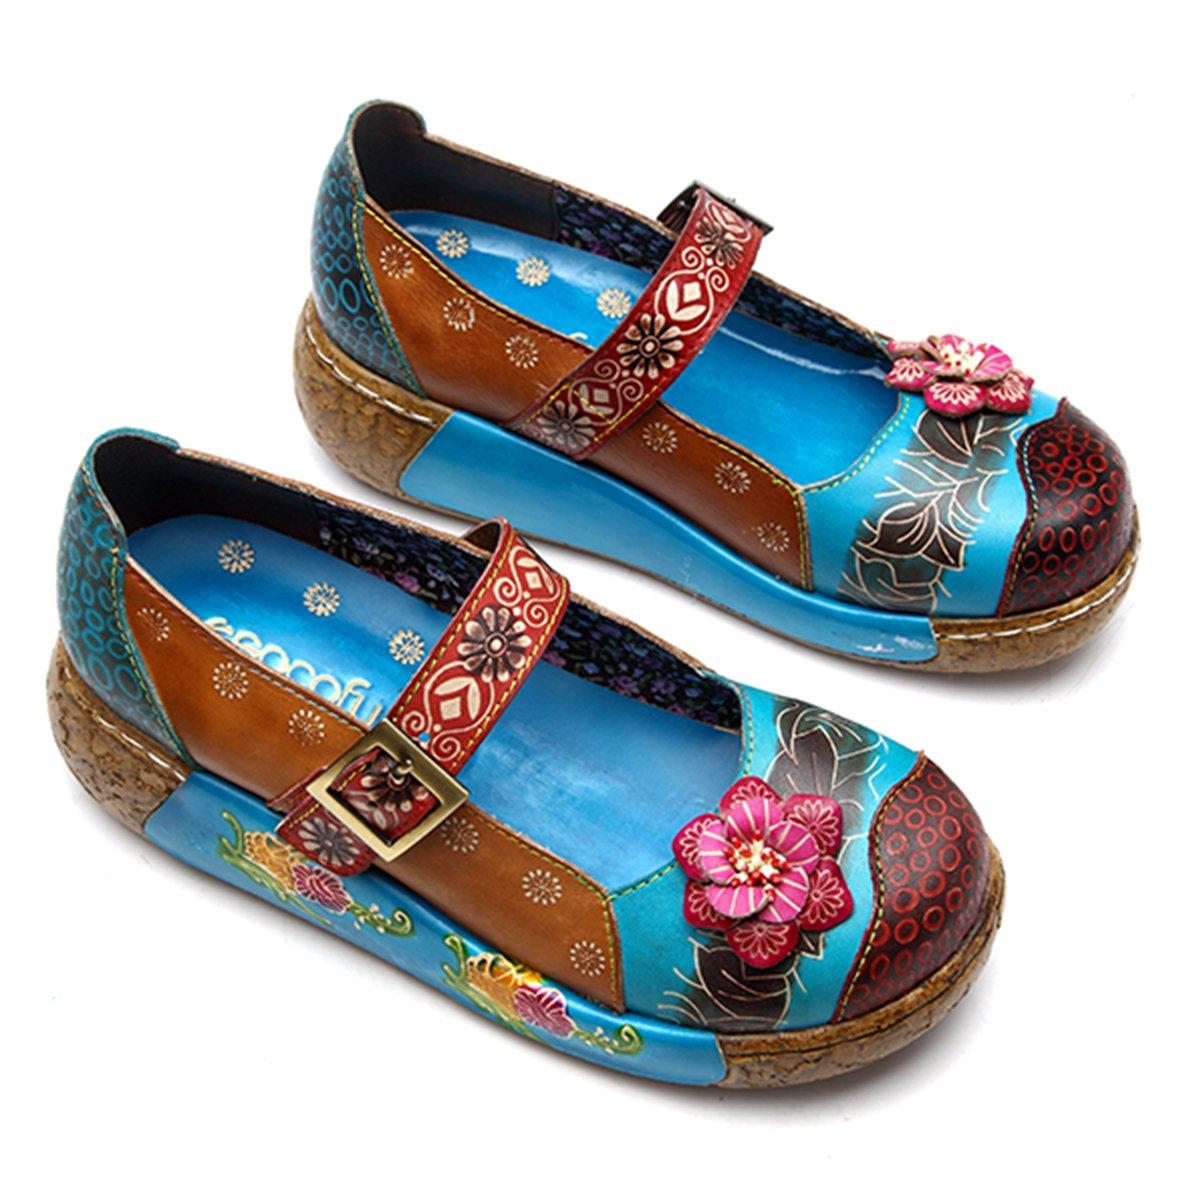 Socofy Damen Damen Damen Mary Jane Mokassins Pantoletten, Sommer Leder Loafer Vintage Blaume Slip-ons Sandalen Pantoffel Slipper Clogs High-Top Blaume Espadrilles Schuhe Hausschuhe  d3de64